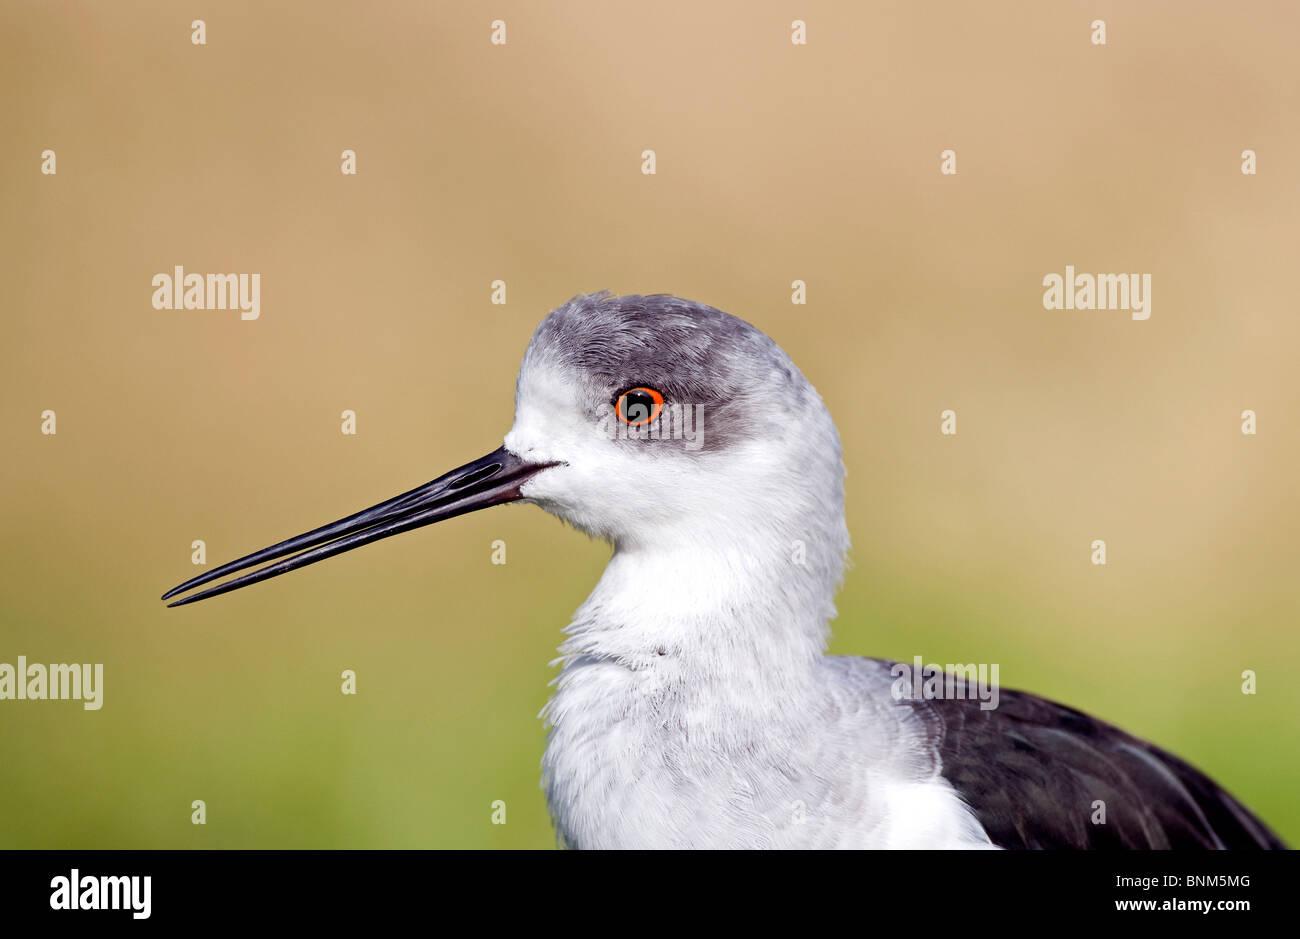 Black-winged Stilt Himantopus himantopus portrait bird animal nature head close up detail portrait profile endangered - Stock Image